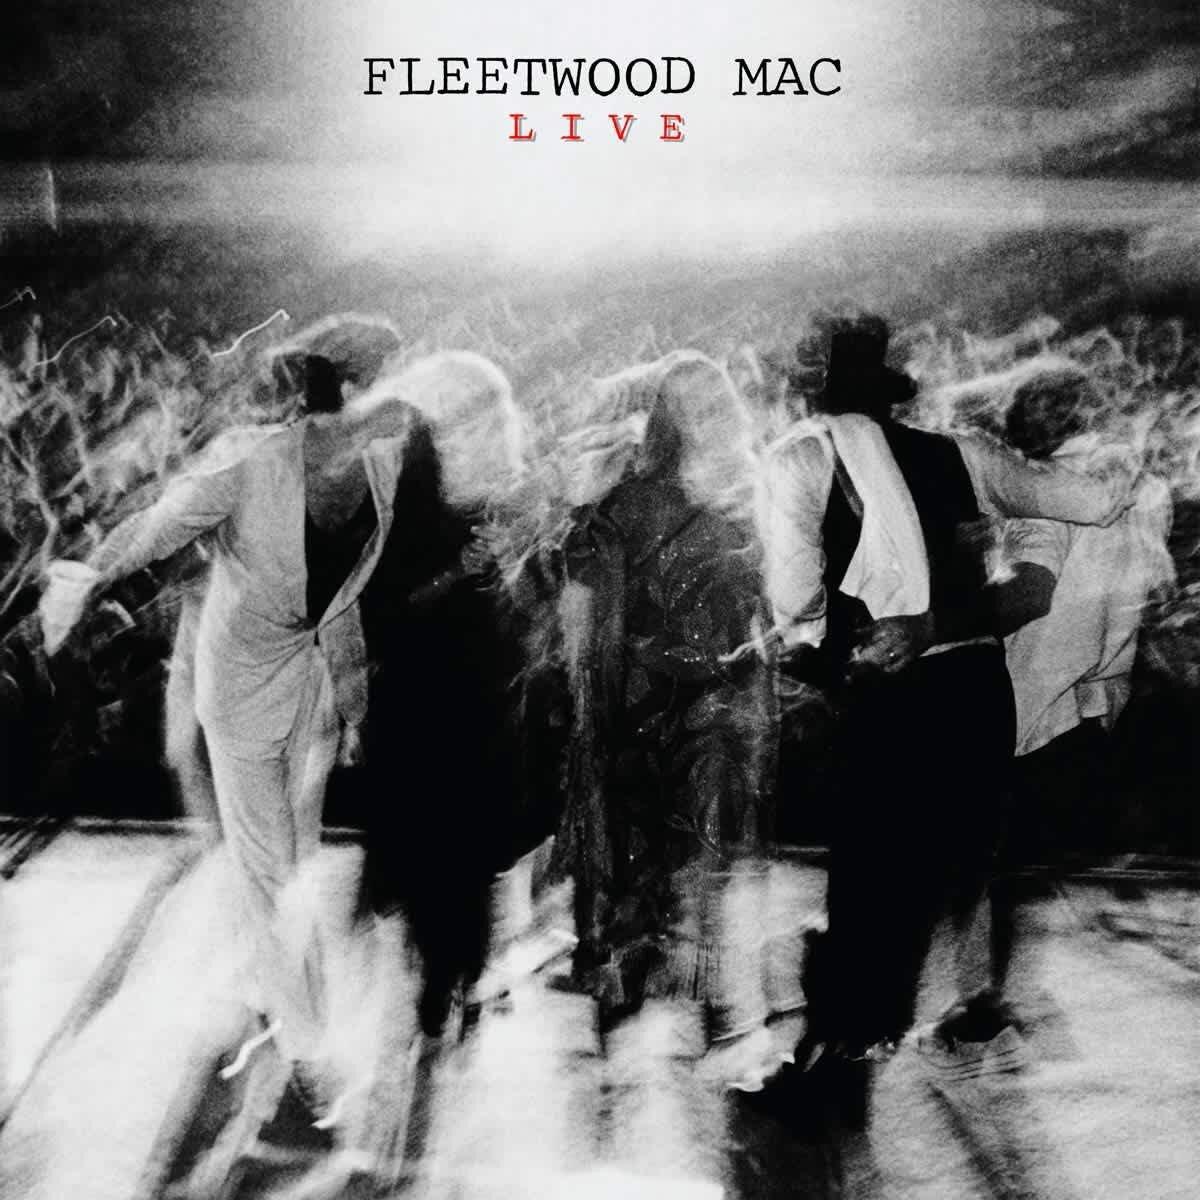 fleetwood mac live box set